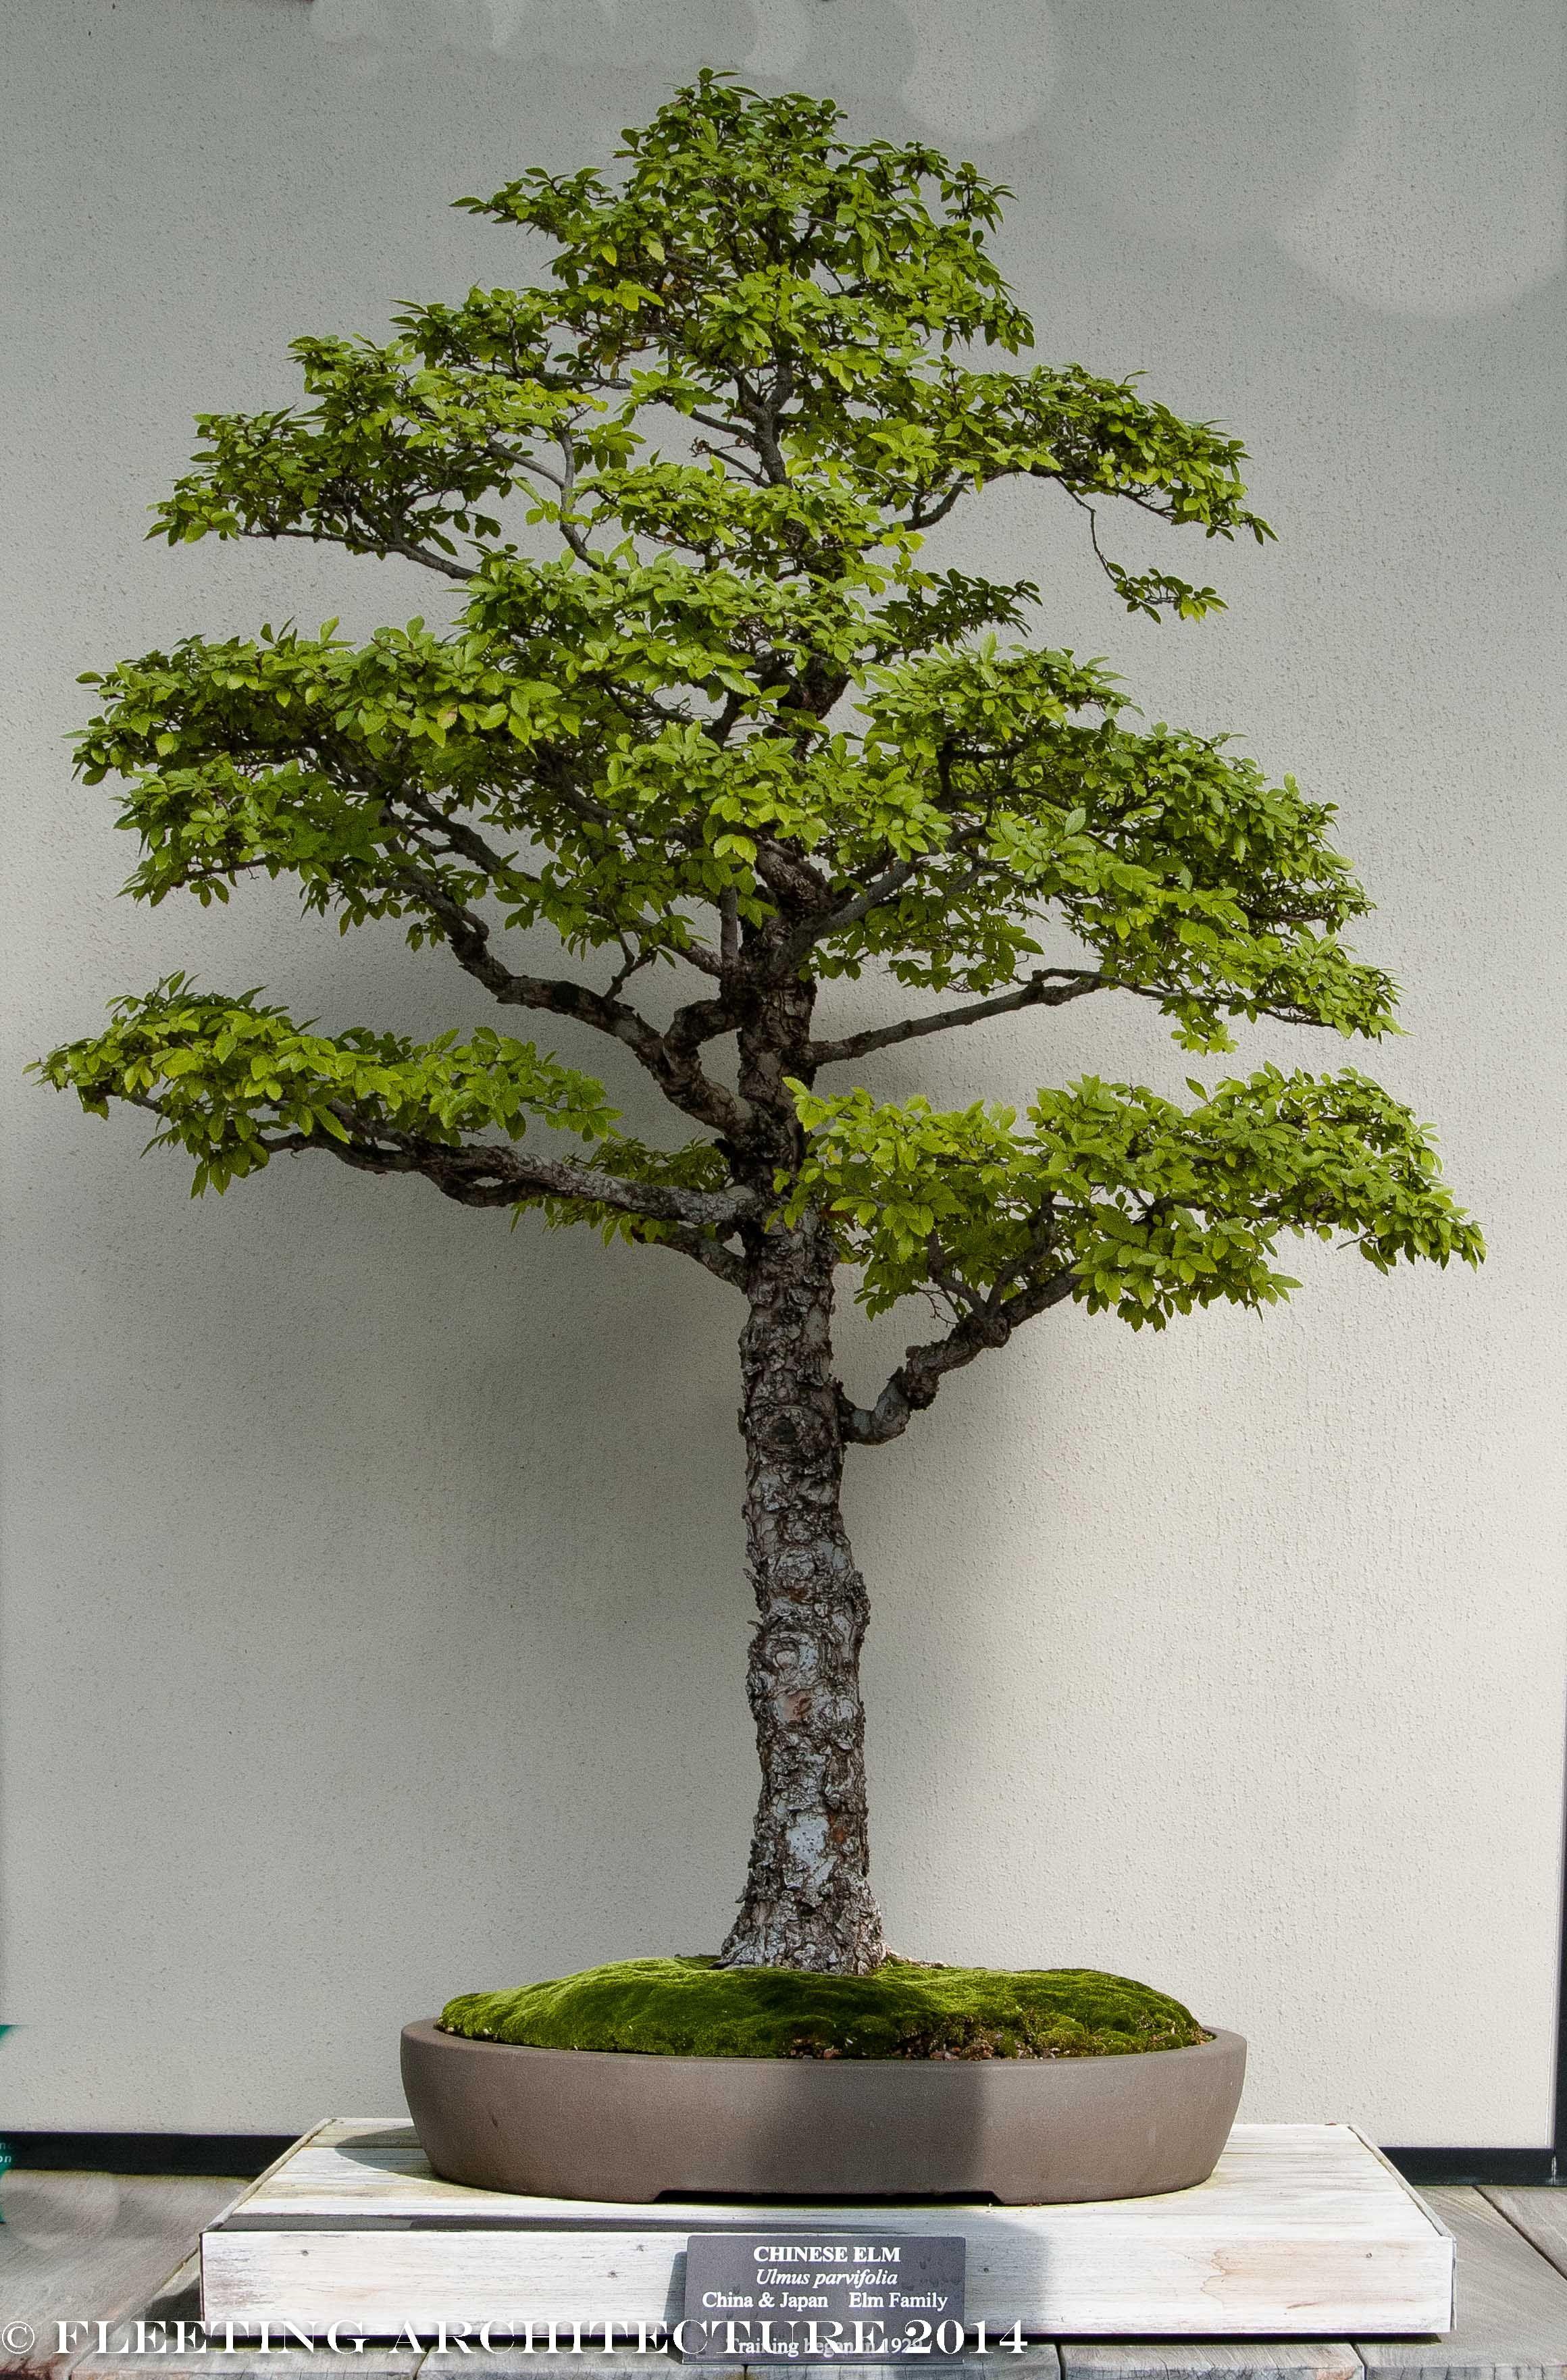 longwood bonsai blog 6 photos for our bonsai lovers bonsai shohin bonsai penjing bonsai. Black Bedroom Furniture Sets. Home Design Ideas